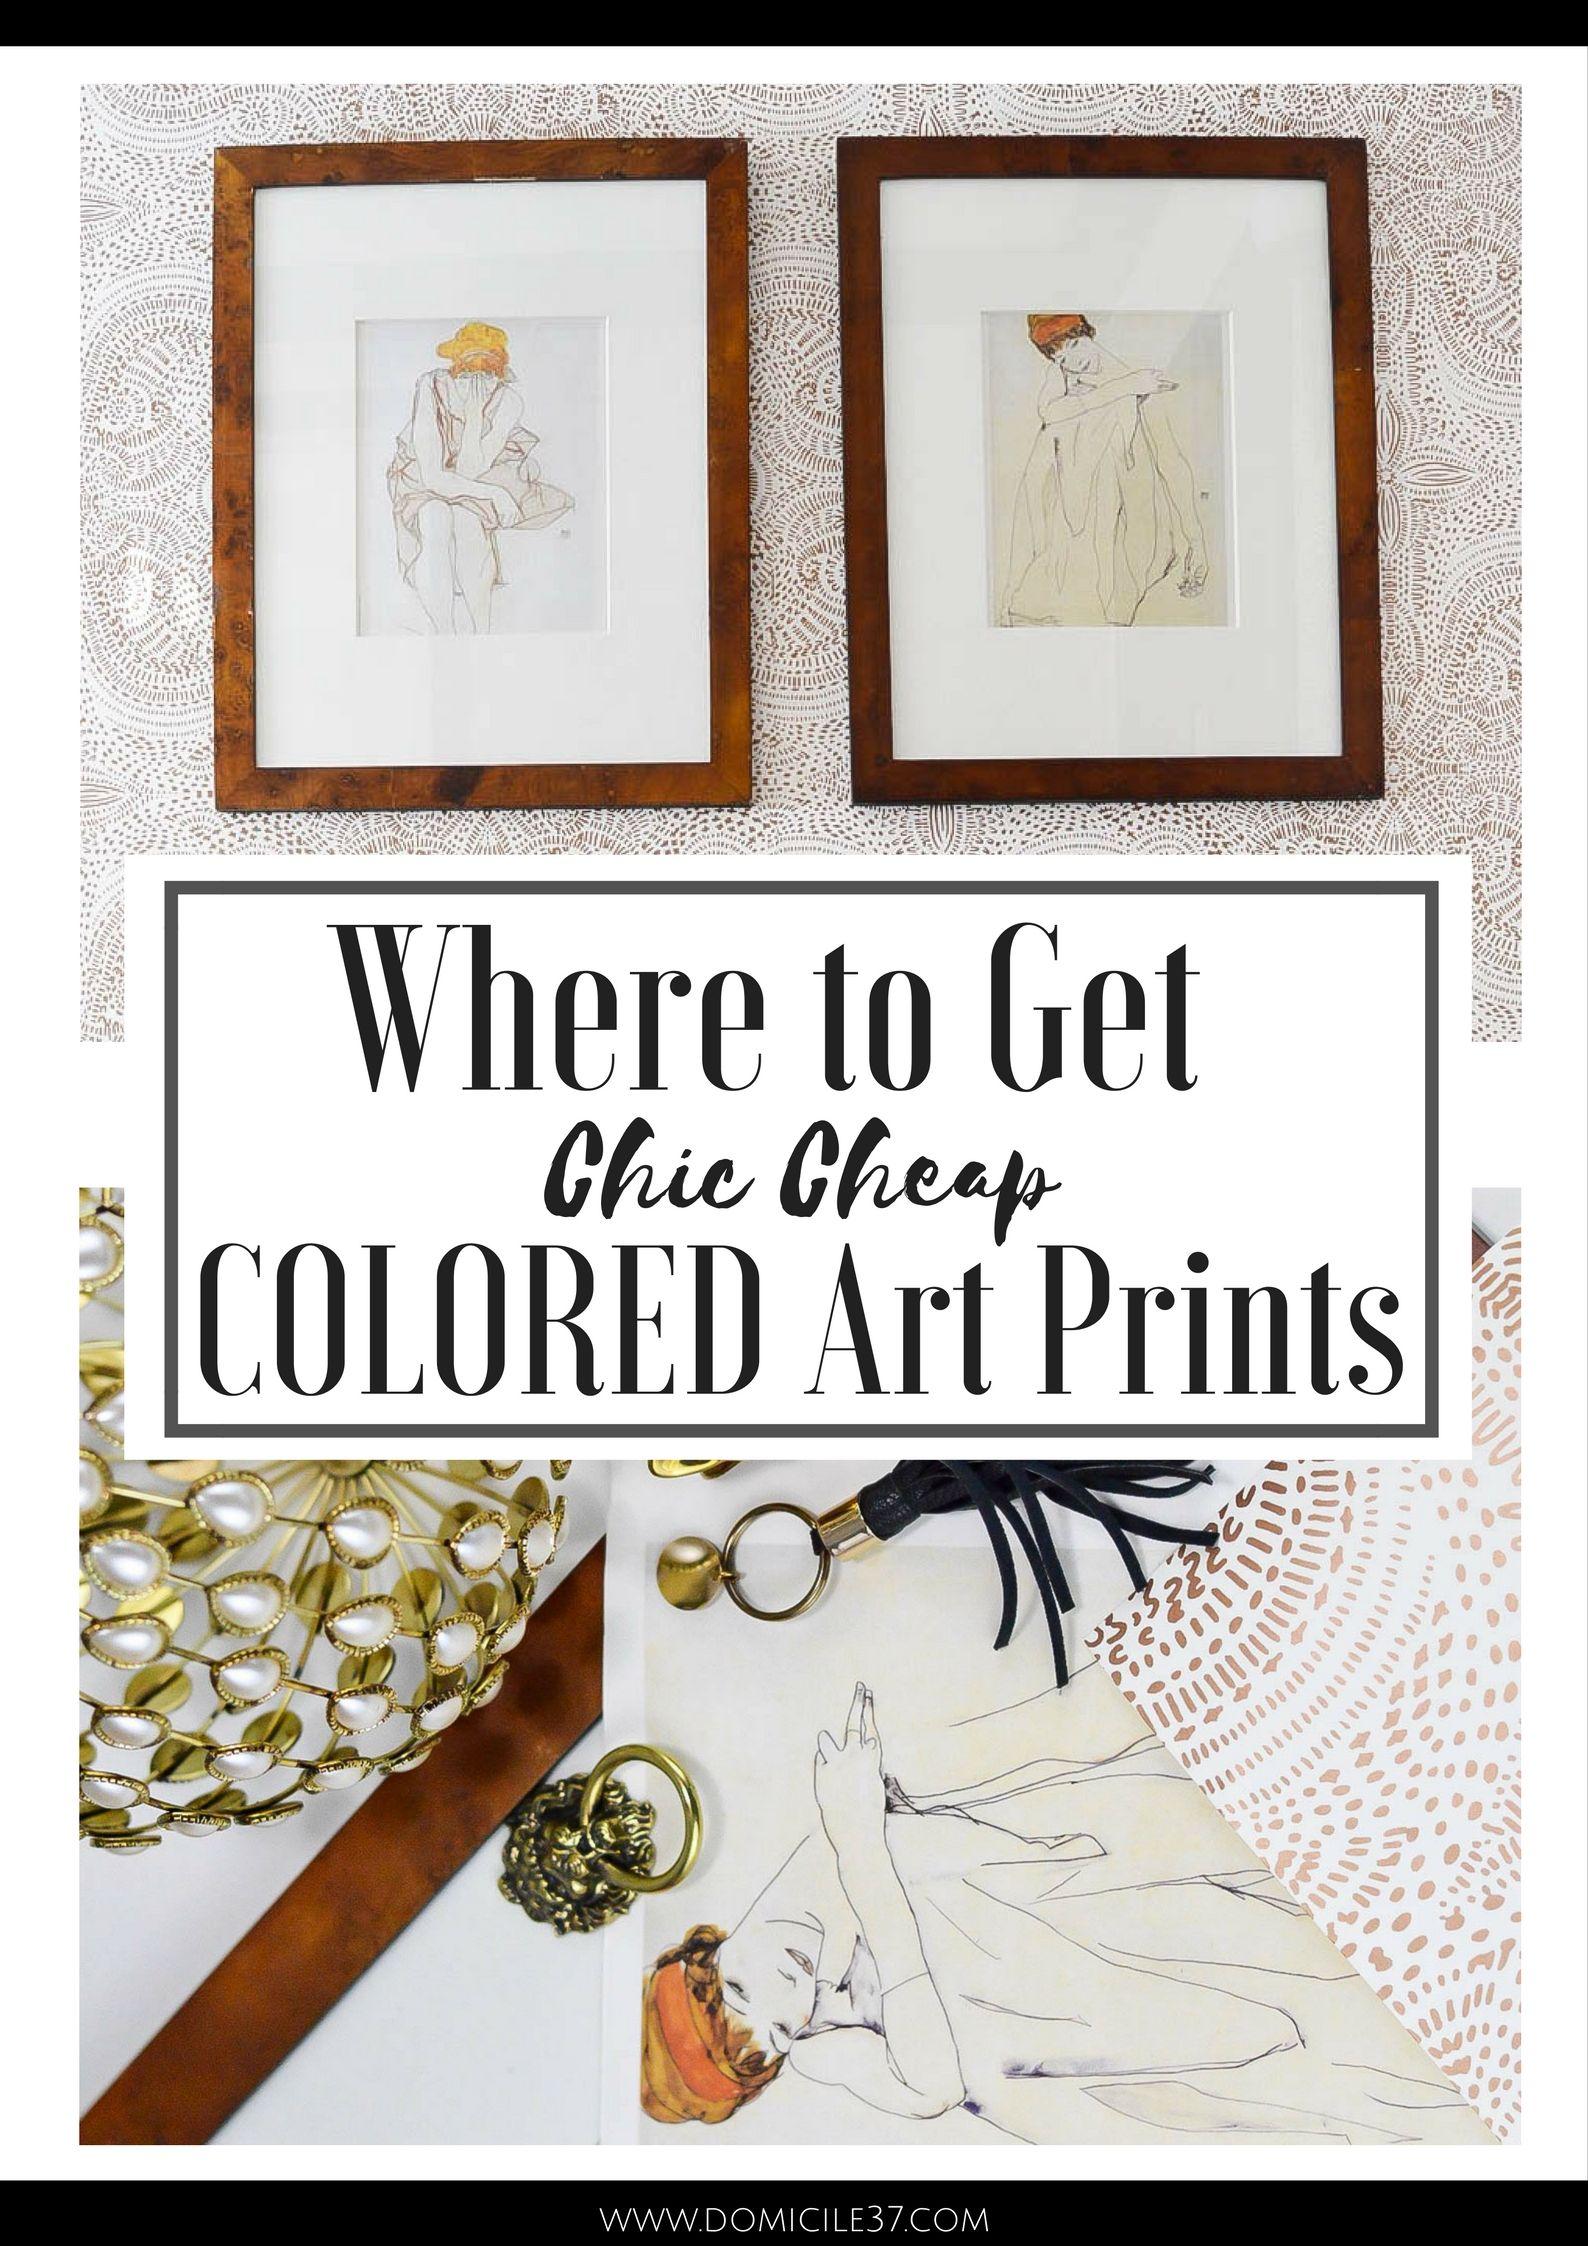 Sharing My Source On Where To Get Chic Cheap Colored Art Prints | DIY  Framed Calendar Art | How To Frame Calendar Art